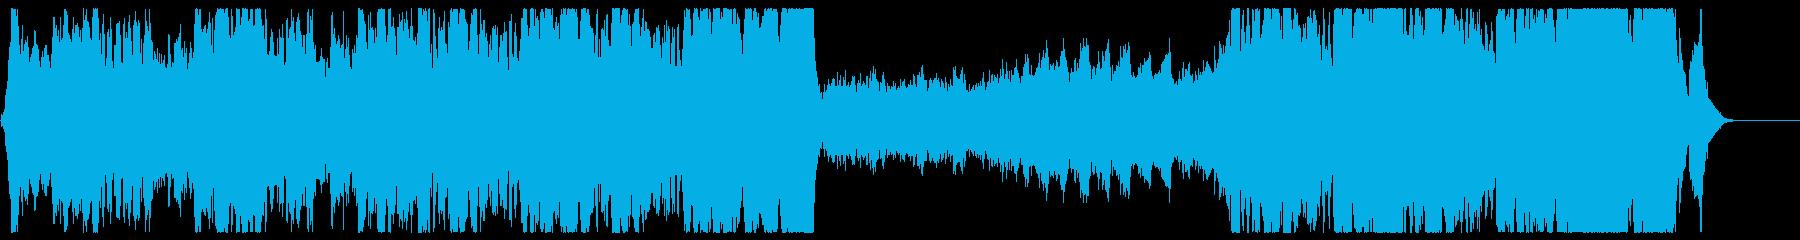 TOON PARADEの再生済みの波形